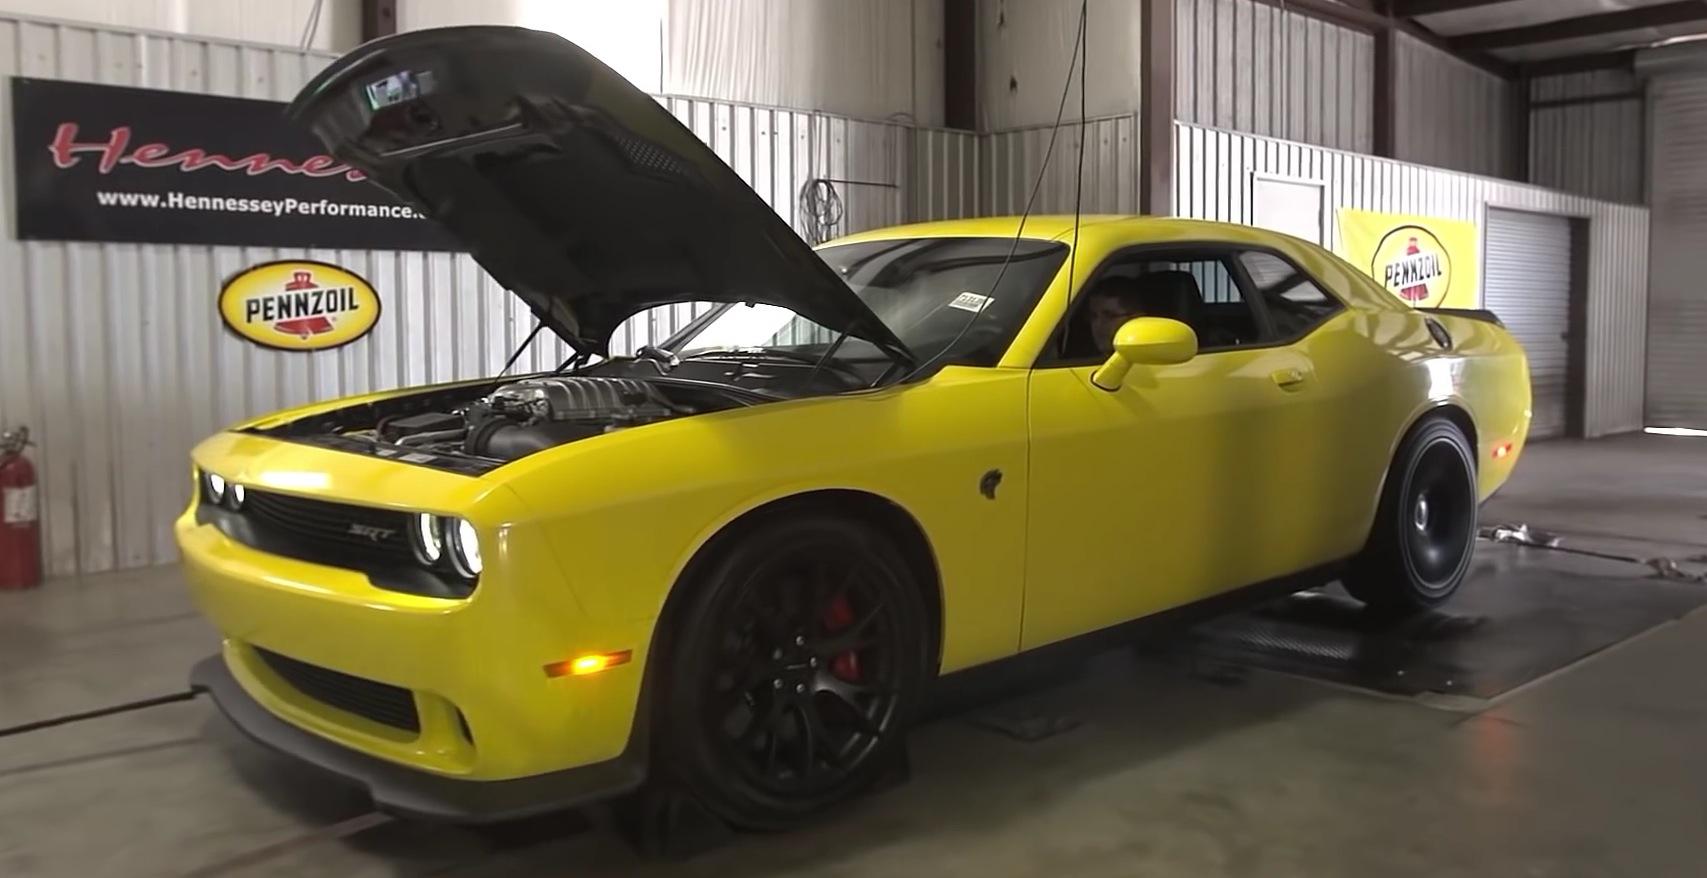 Dodge Challenger Hellcat to Receive Hennessey Power Upgrade